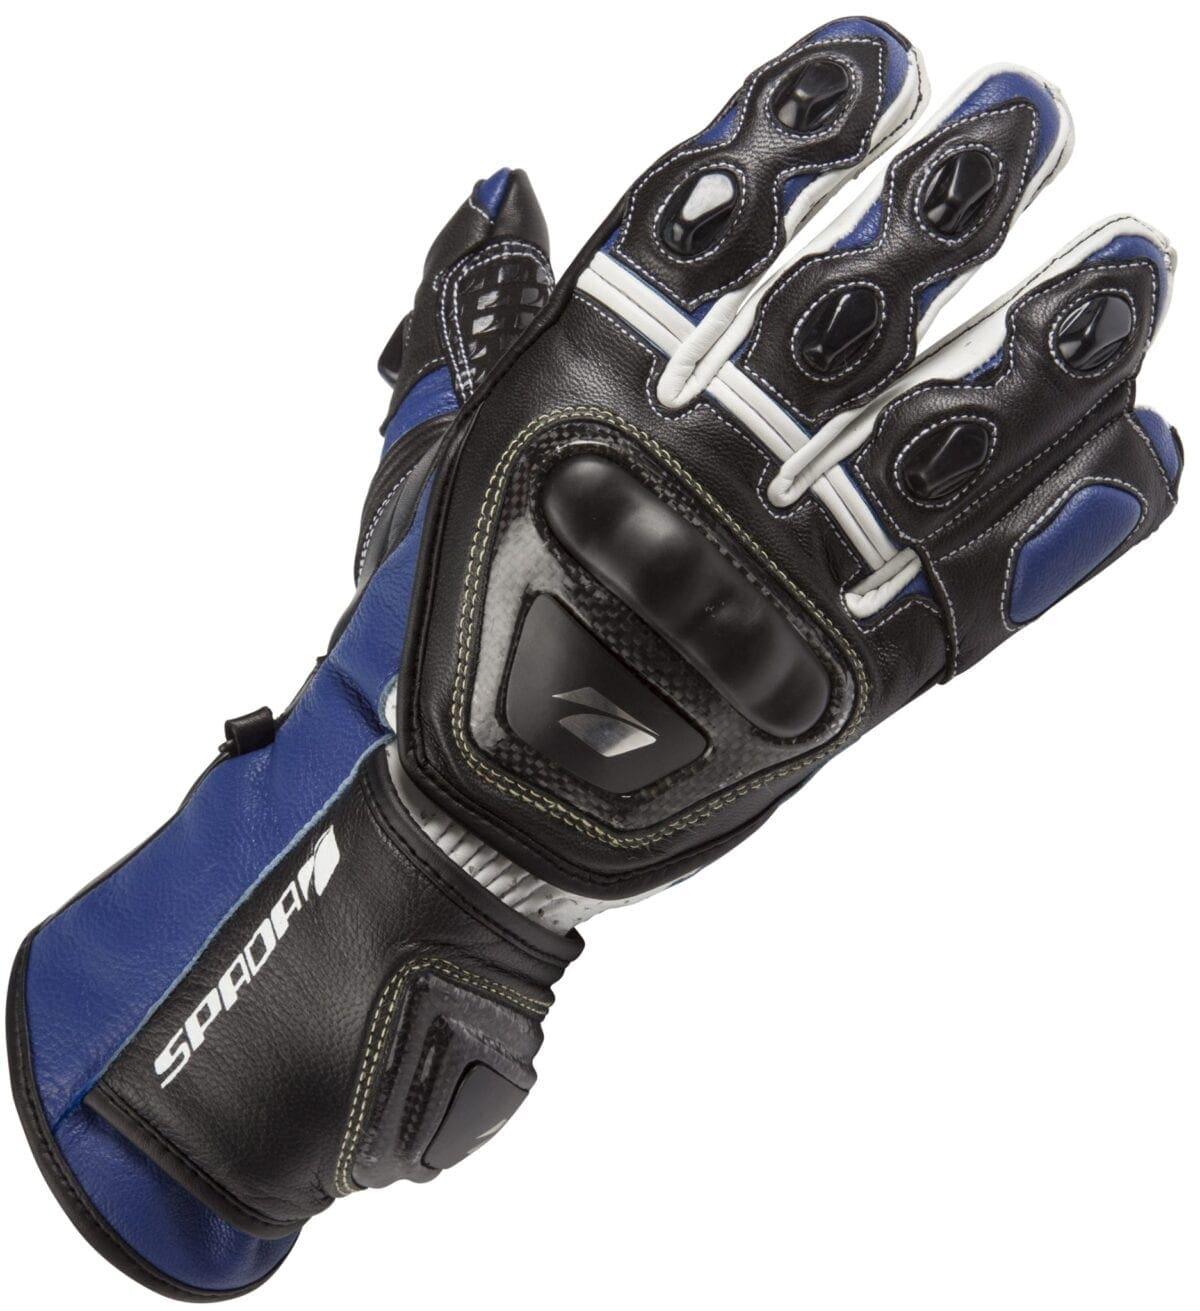 060_Kit_curve_glove